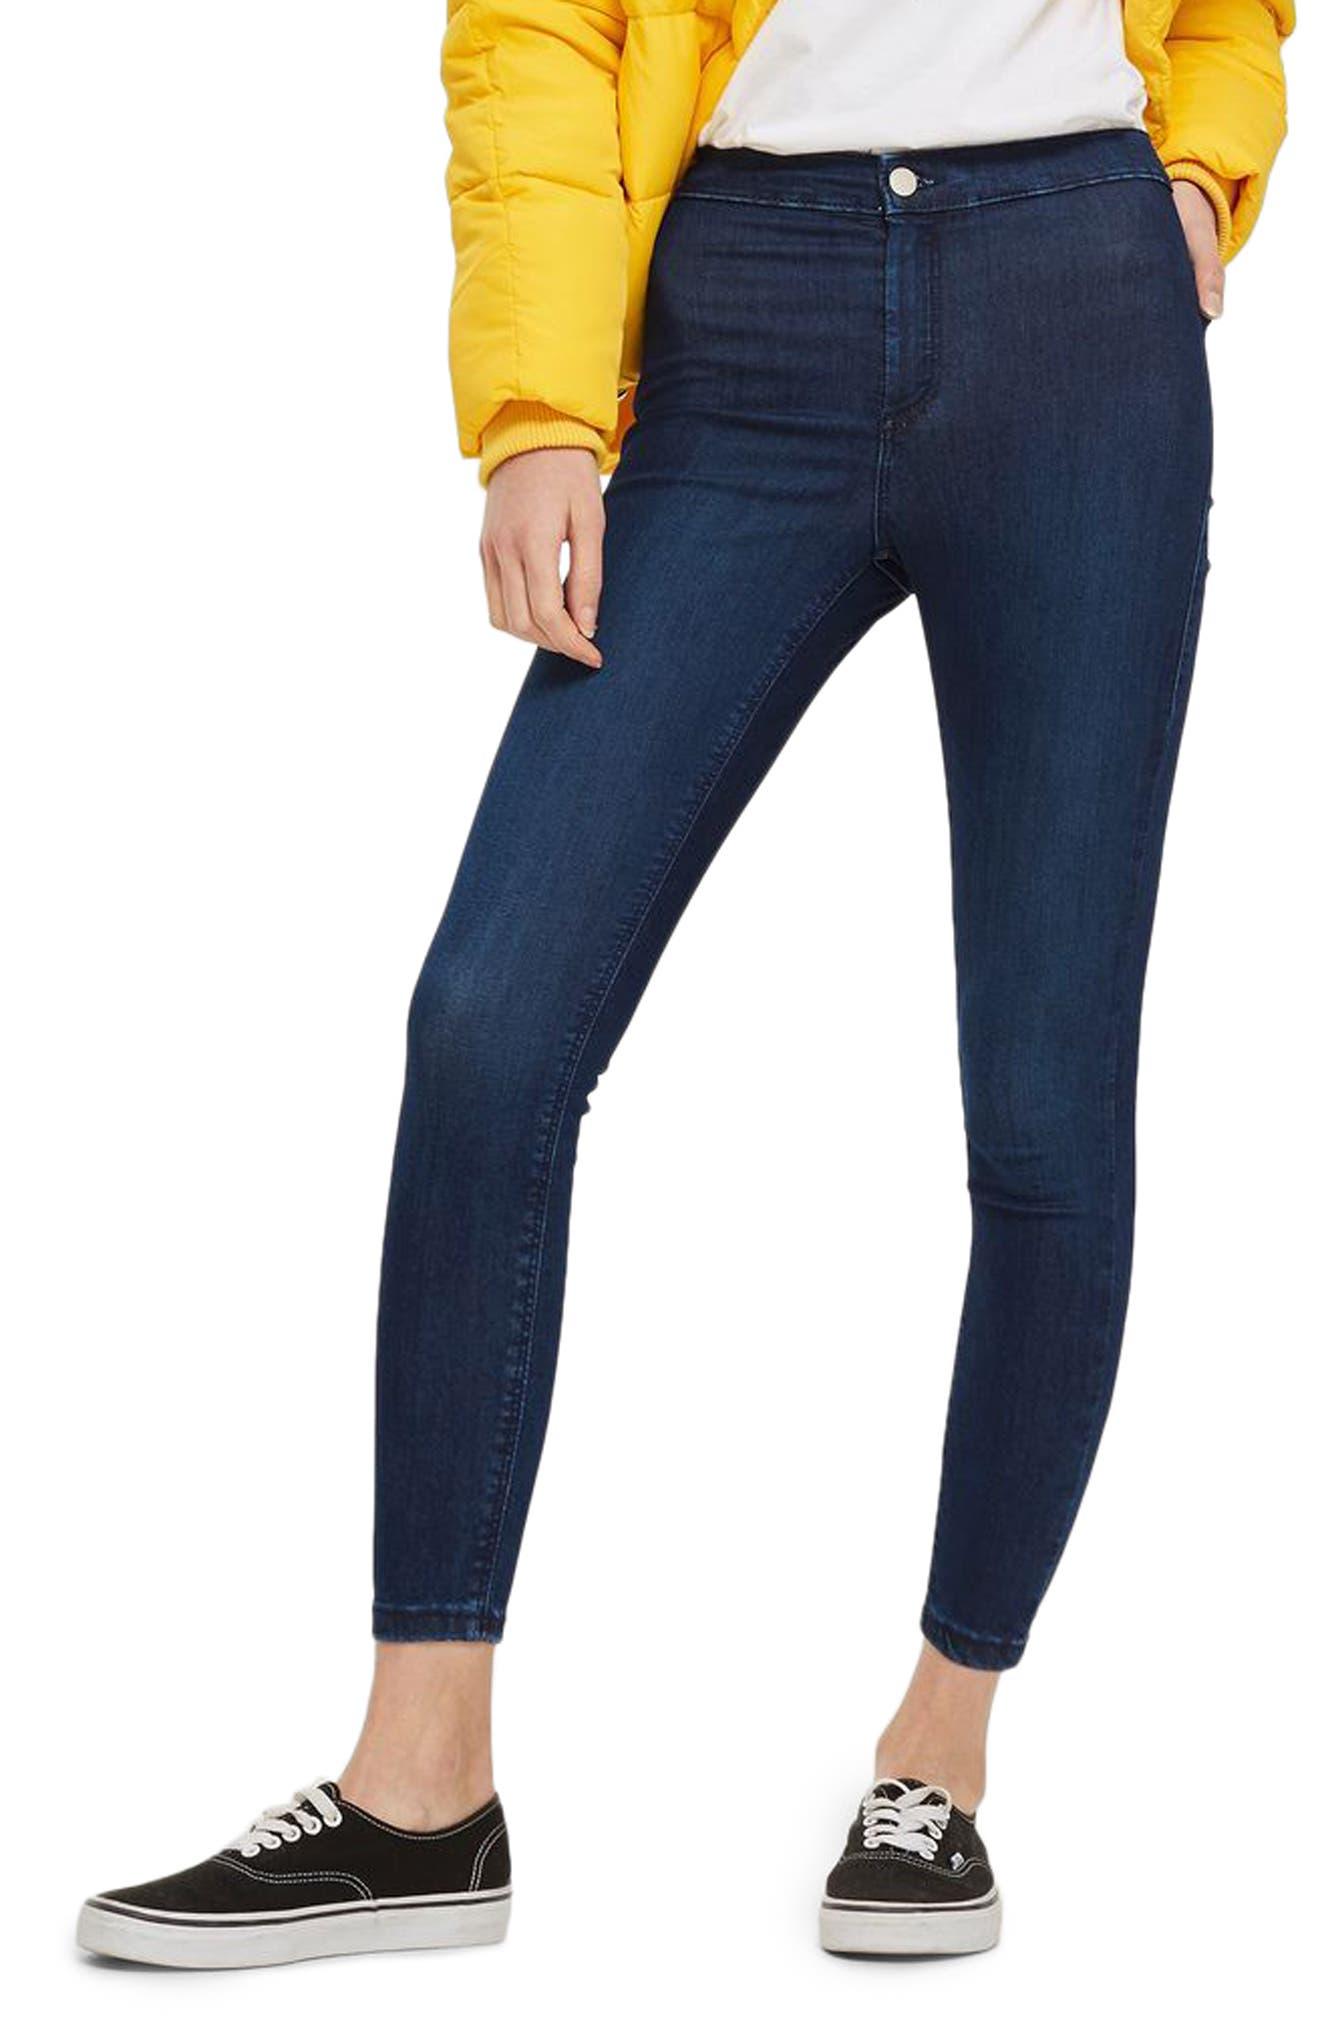 Main Image - Topshop Joni High Waist Skinny Jeans (Petite)